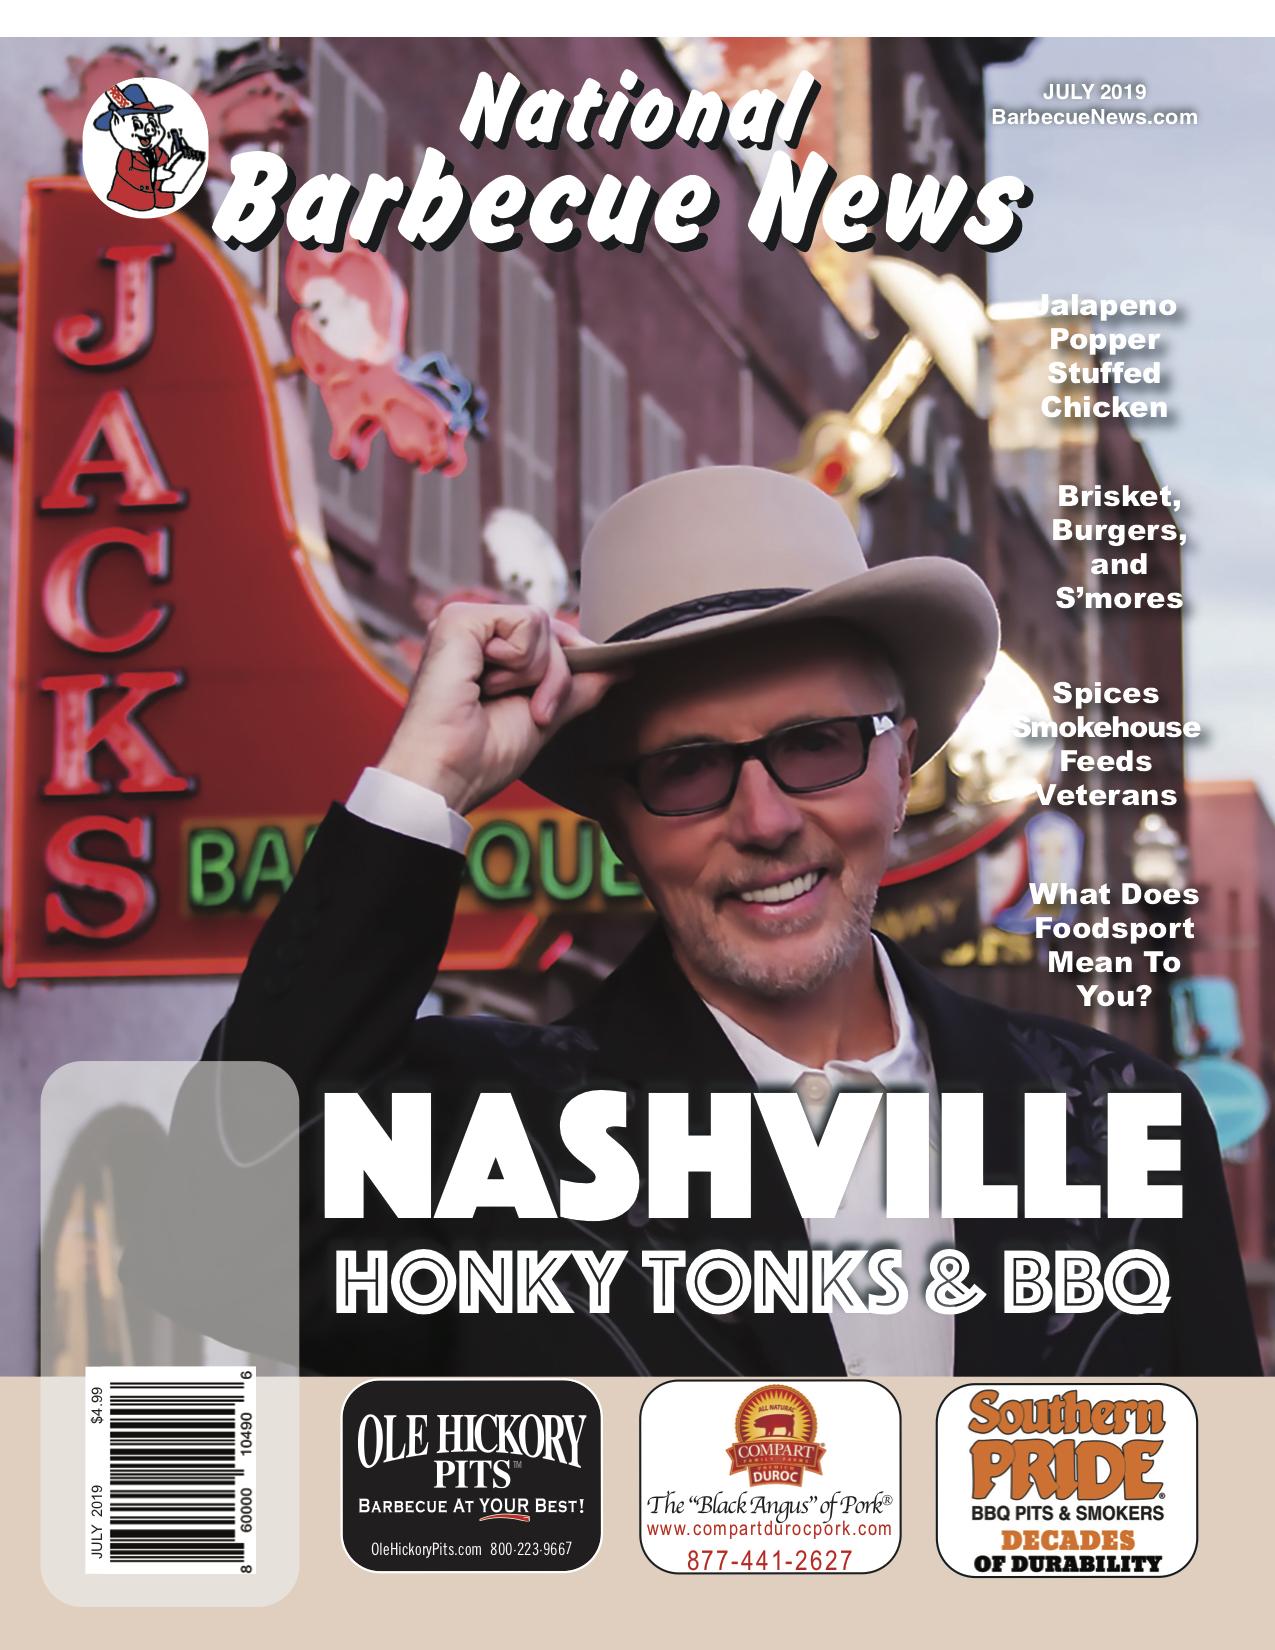 Barbecue News: The Original Grilling & BBQ Magazine